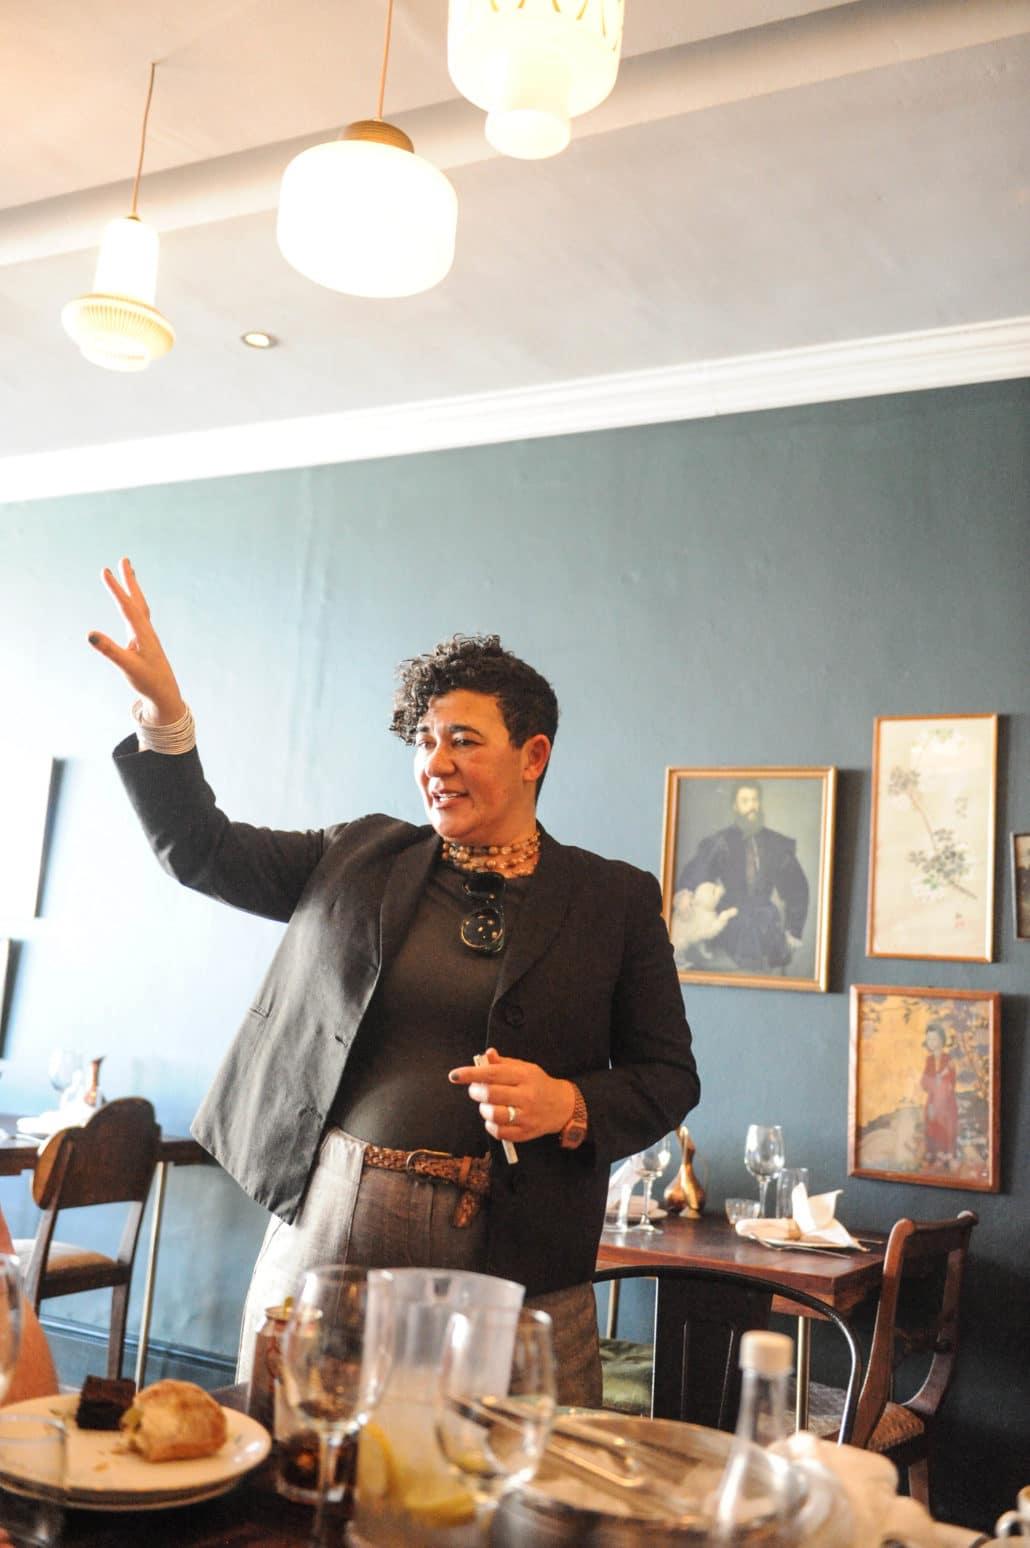 Karen Dudley: chef, writer, owner of The Kitchen